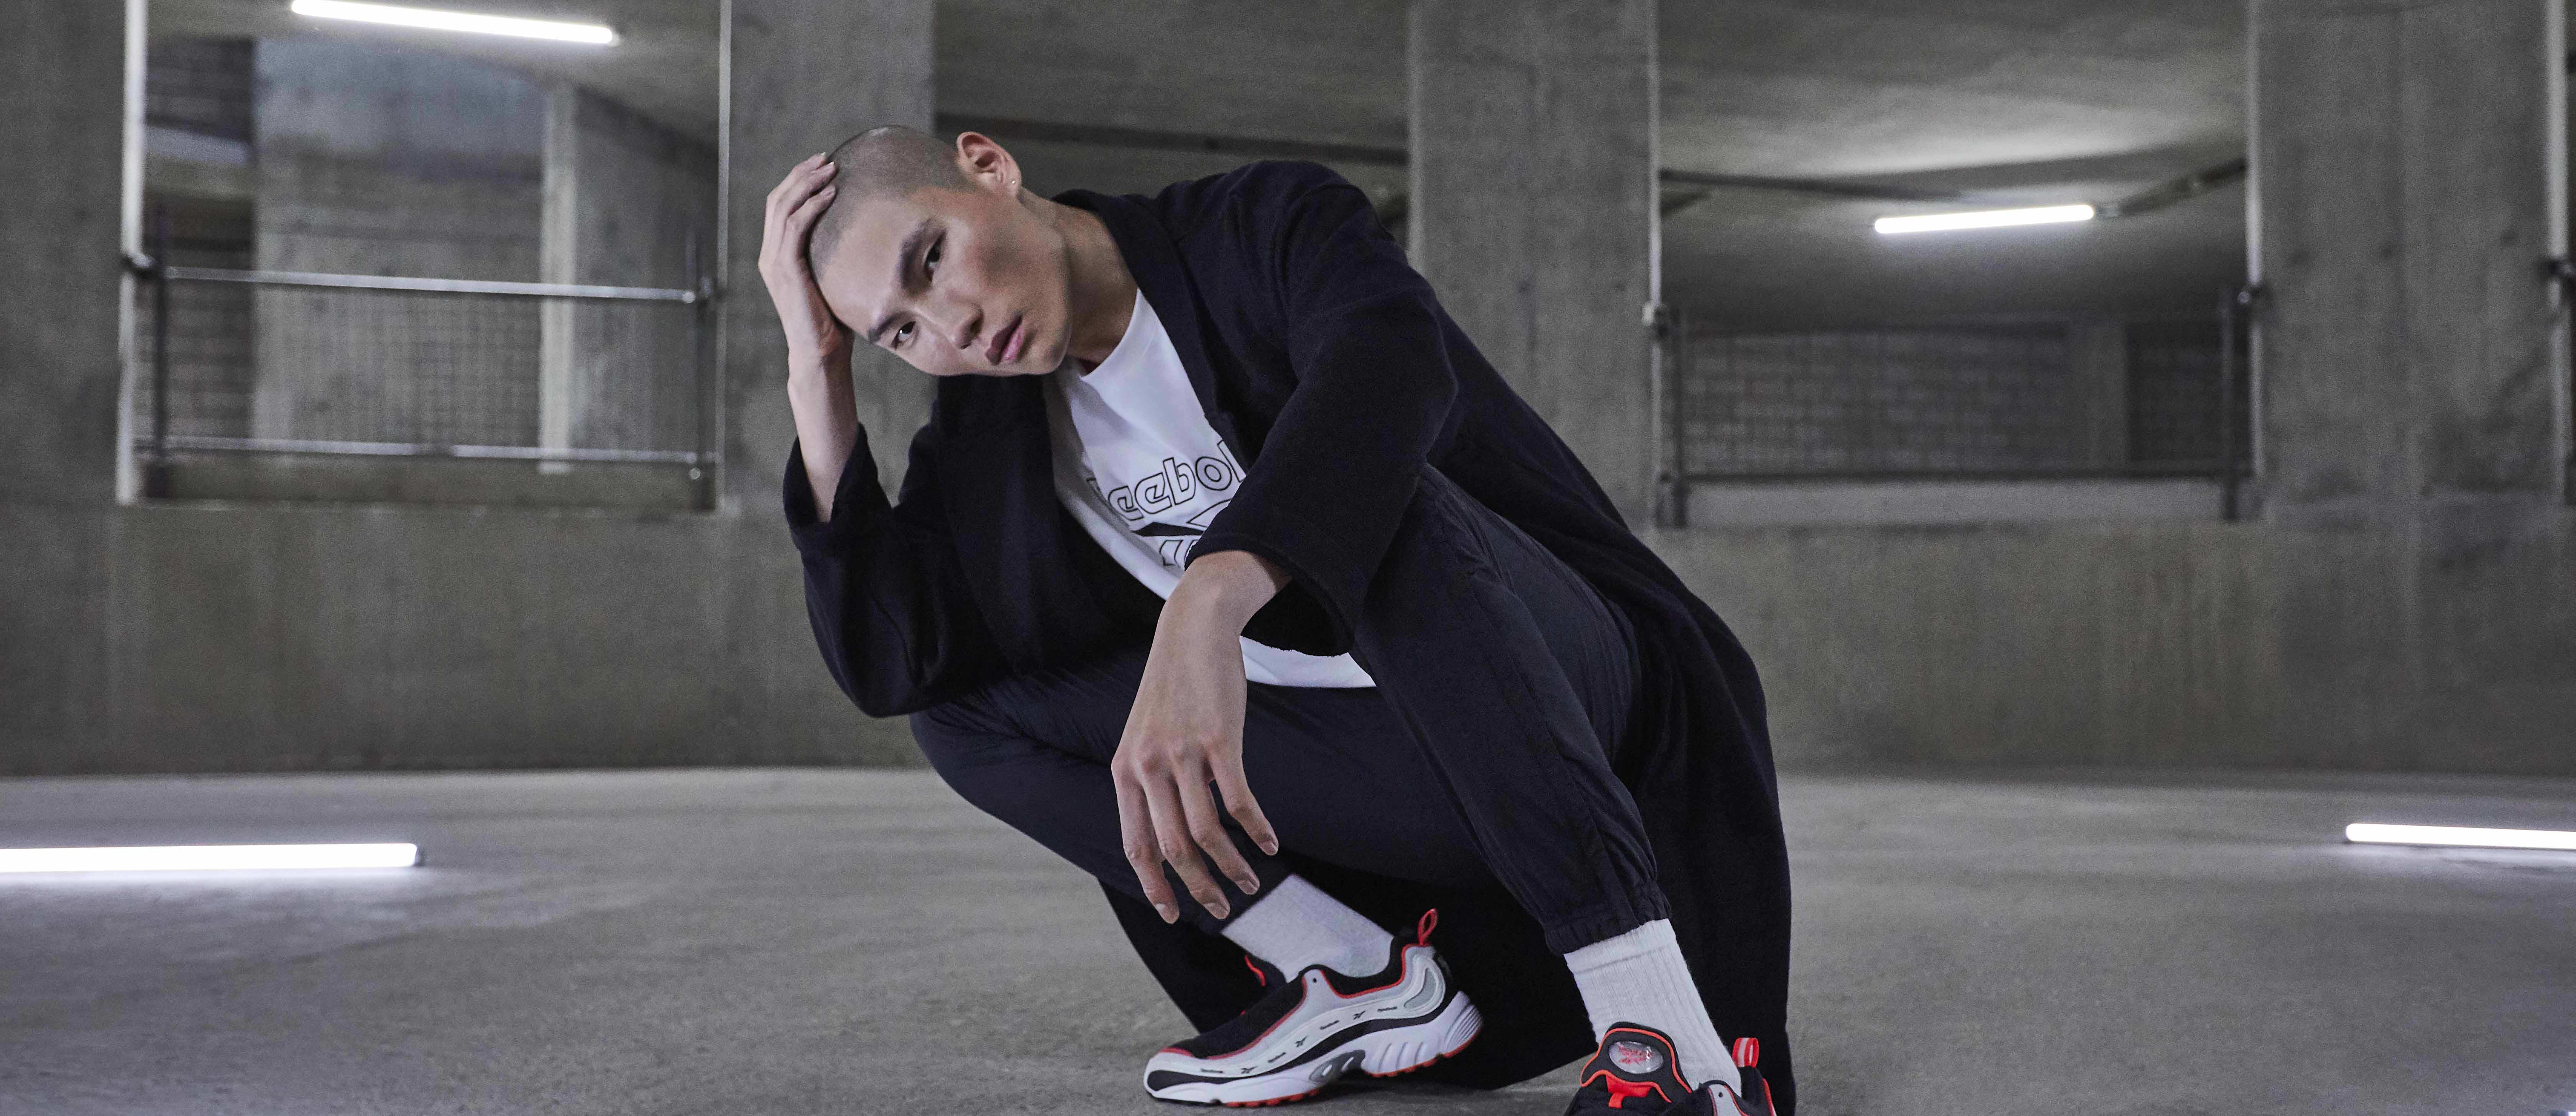 Jean Chang élève la sneaker au rang d'œuvre d'art